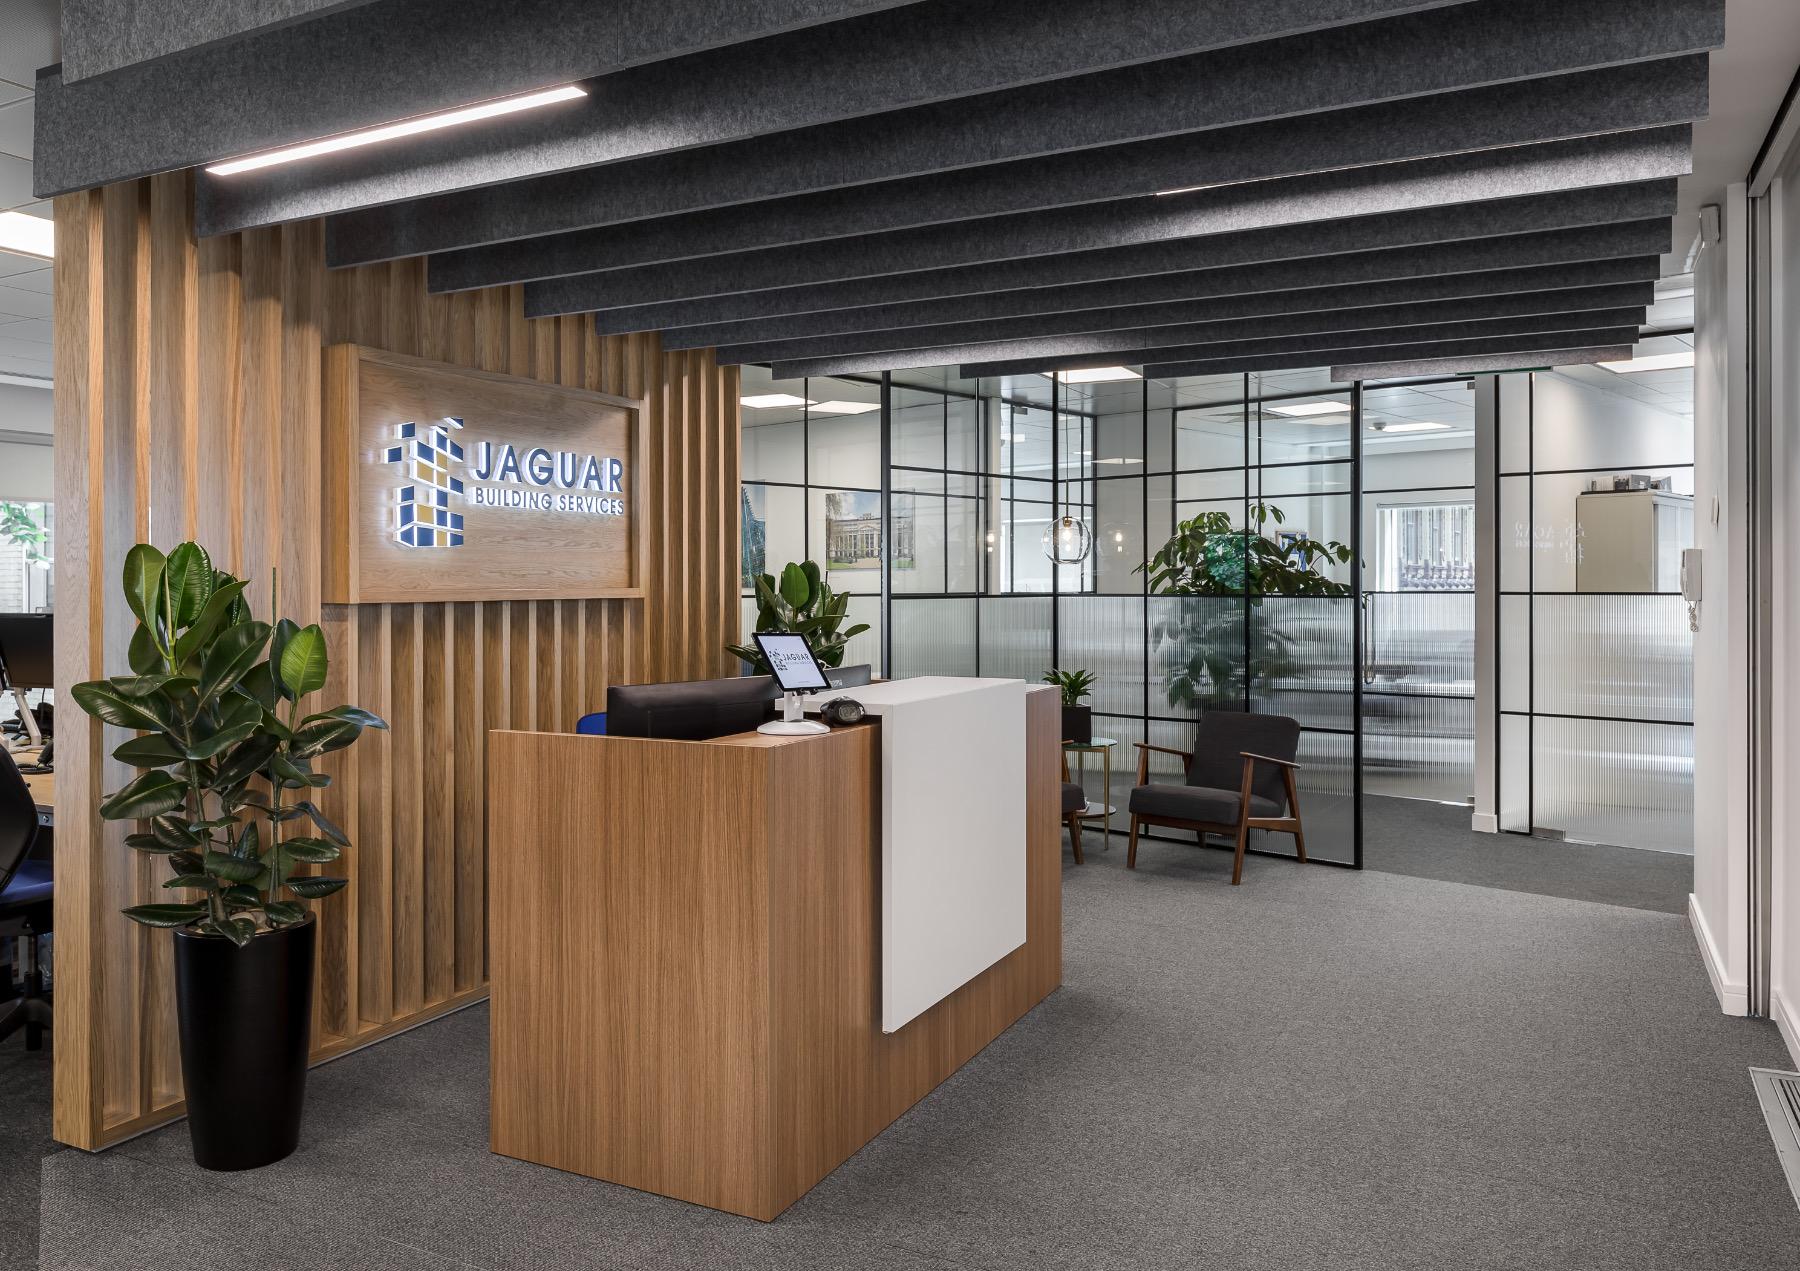 jaguar-office-london-1